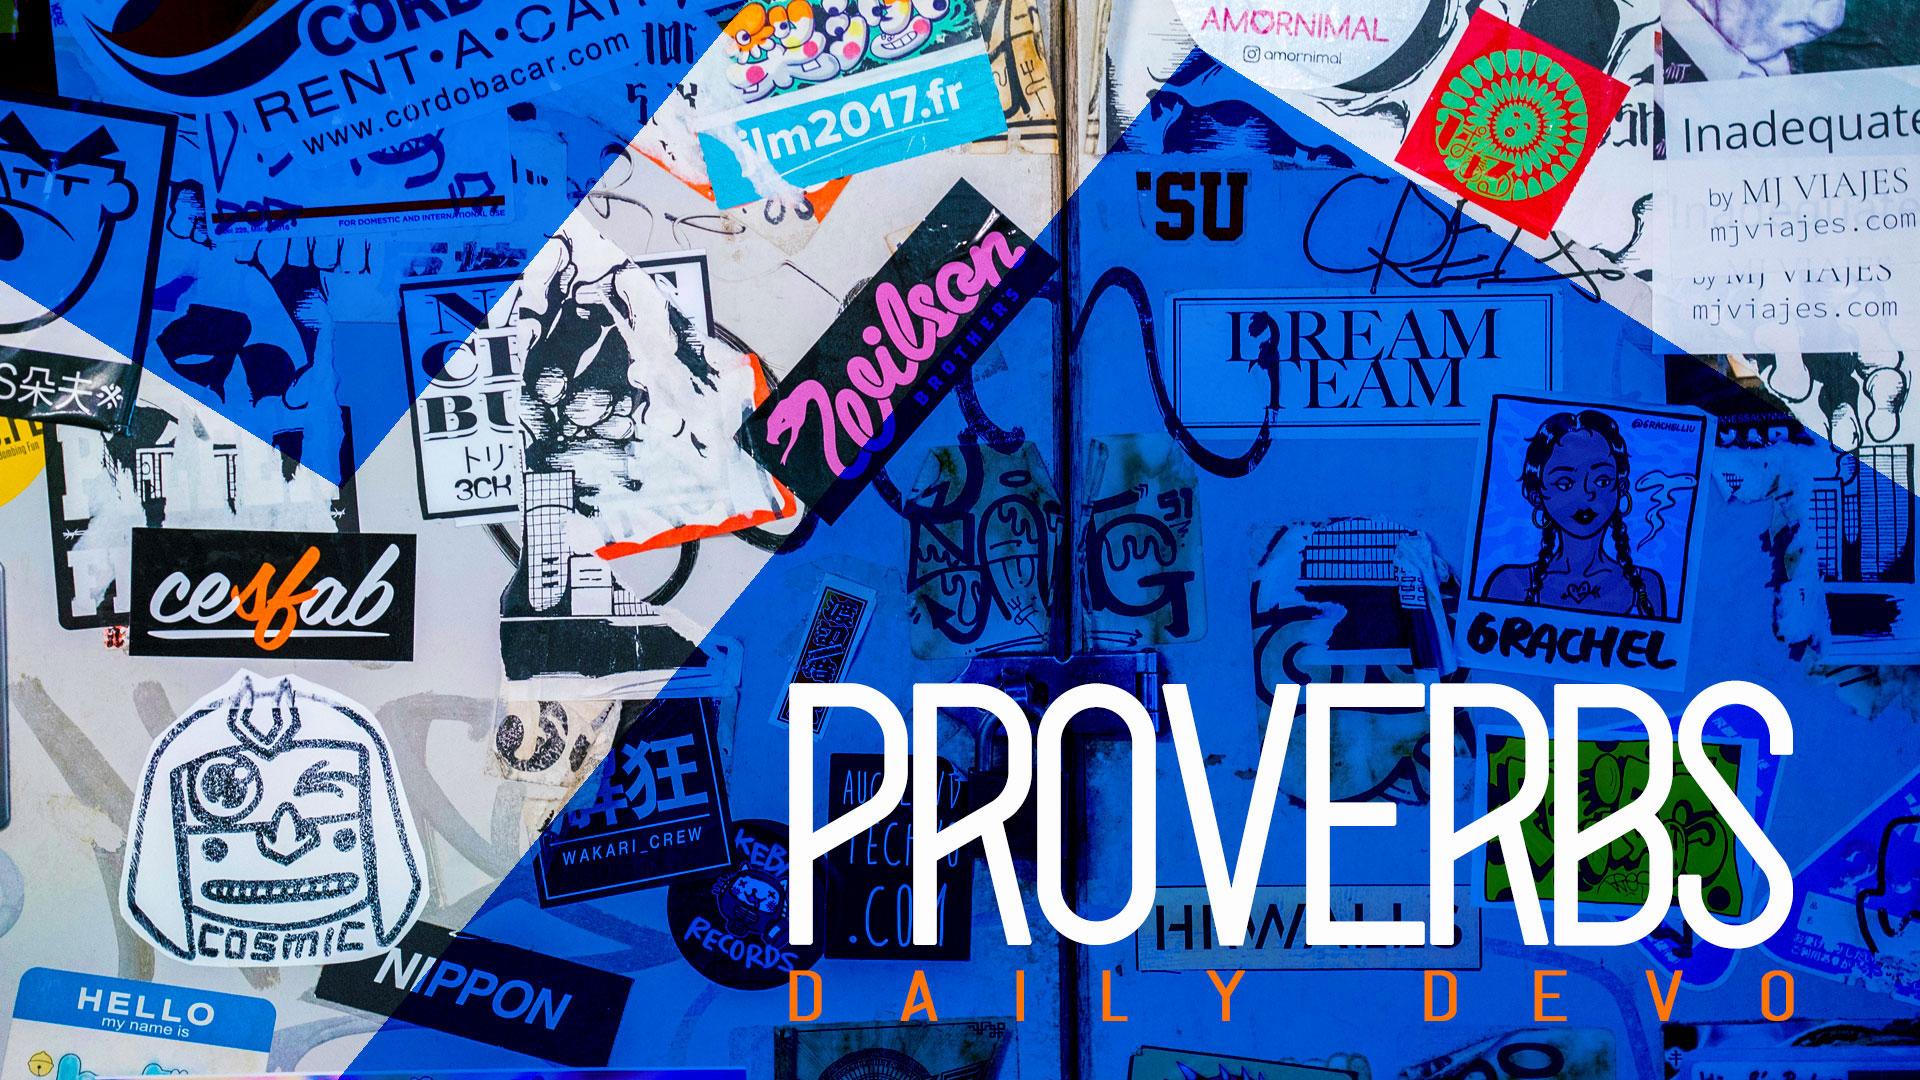 Series: Proverbs